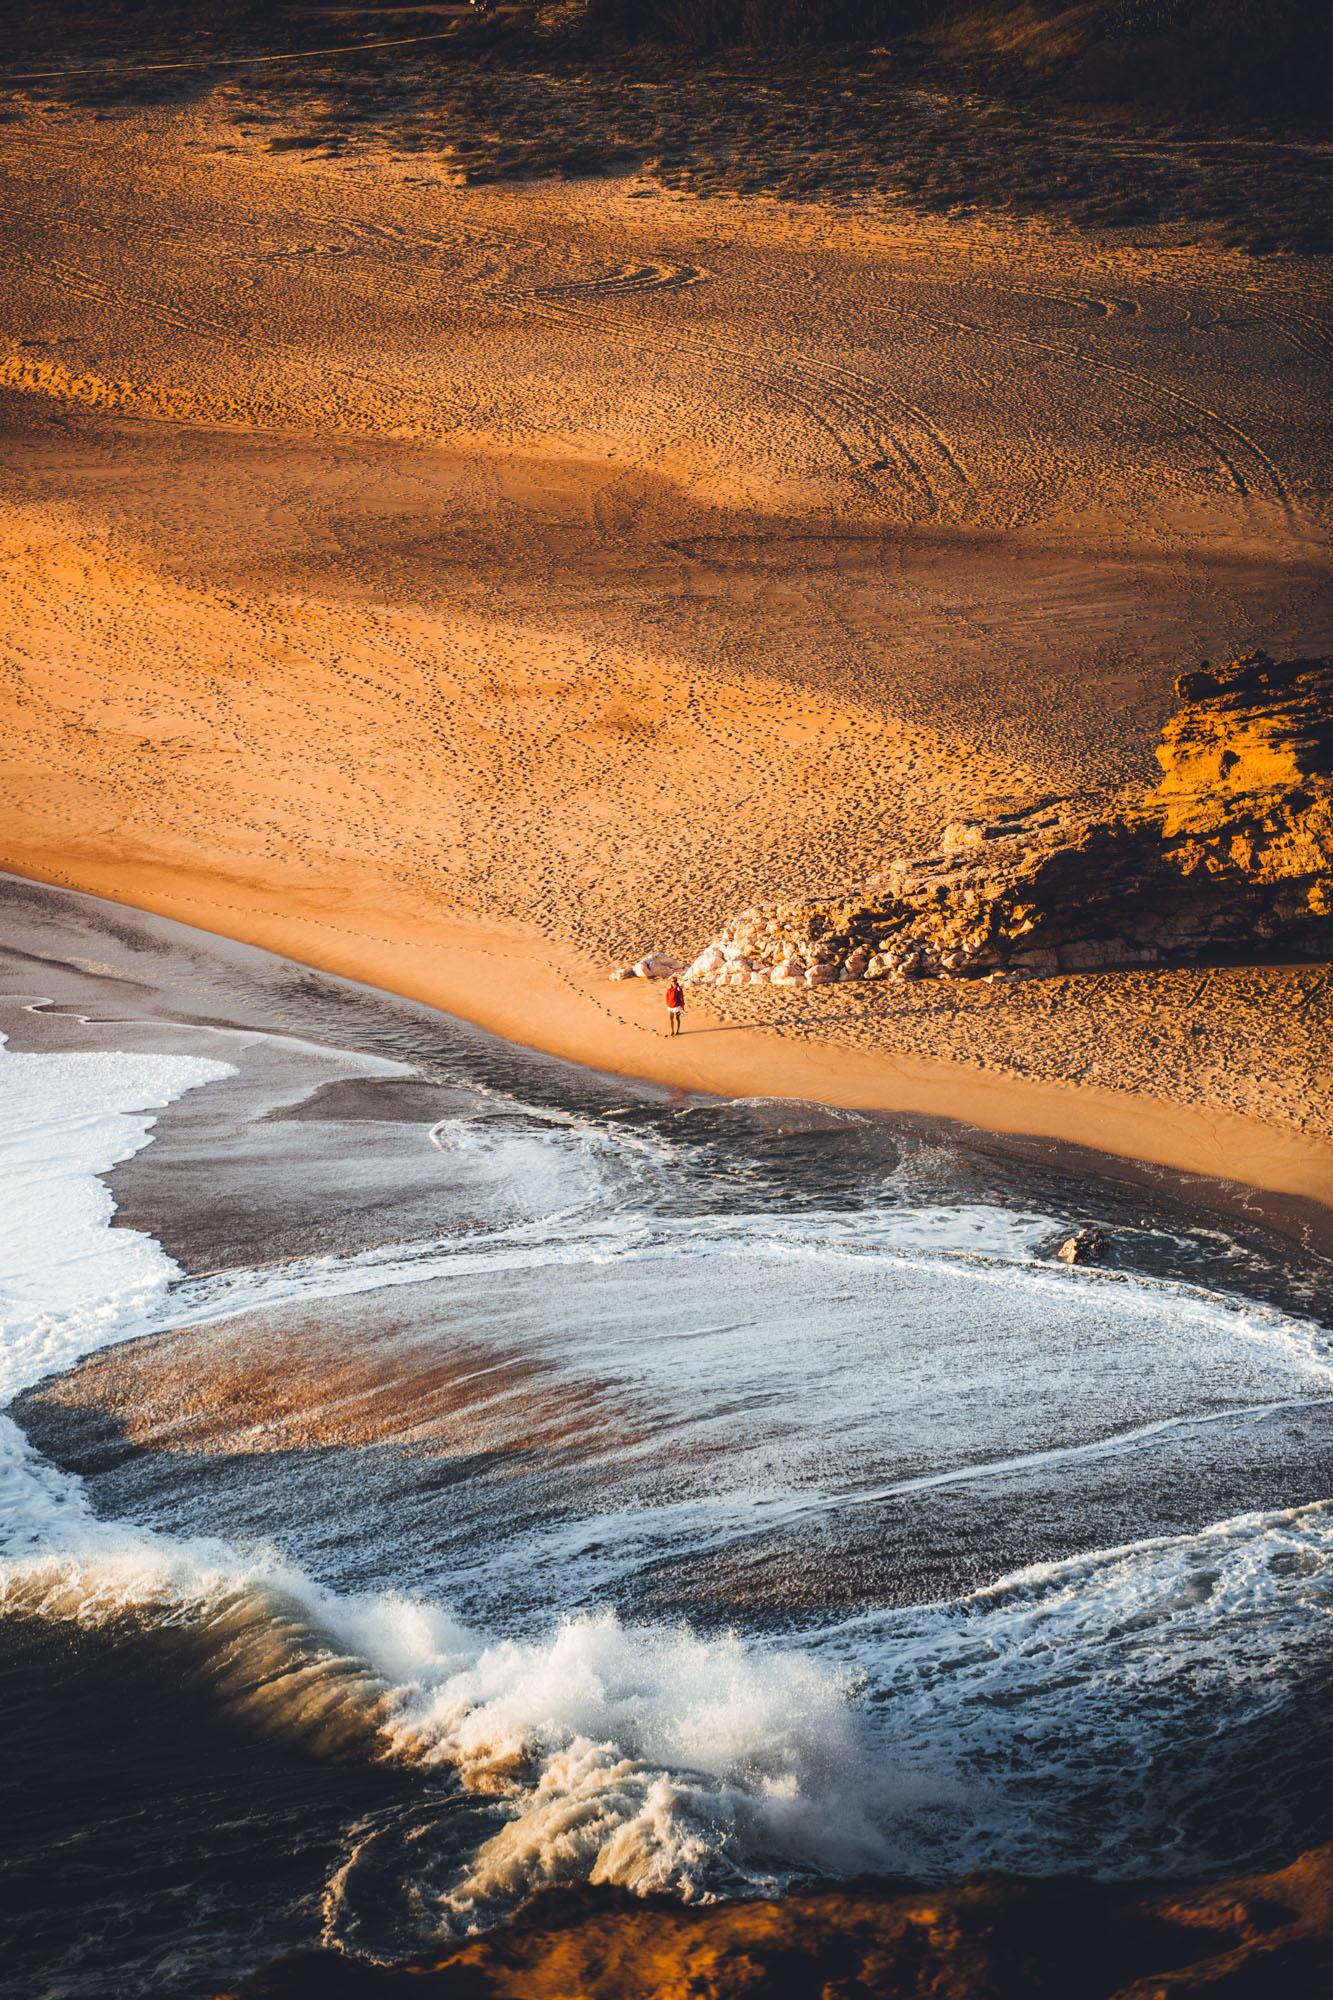 Portugal © Lukas Schlösser